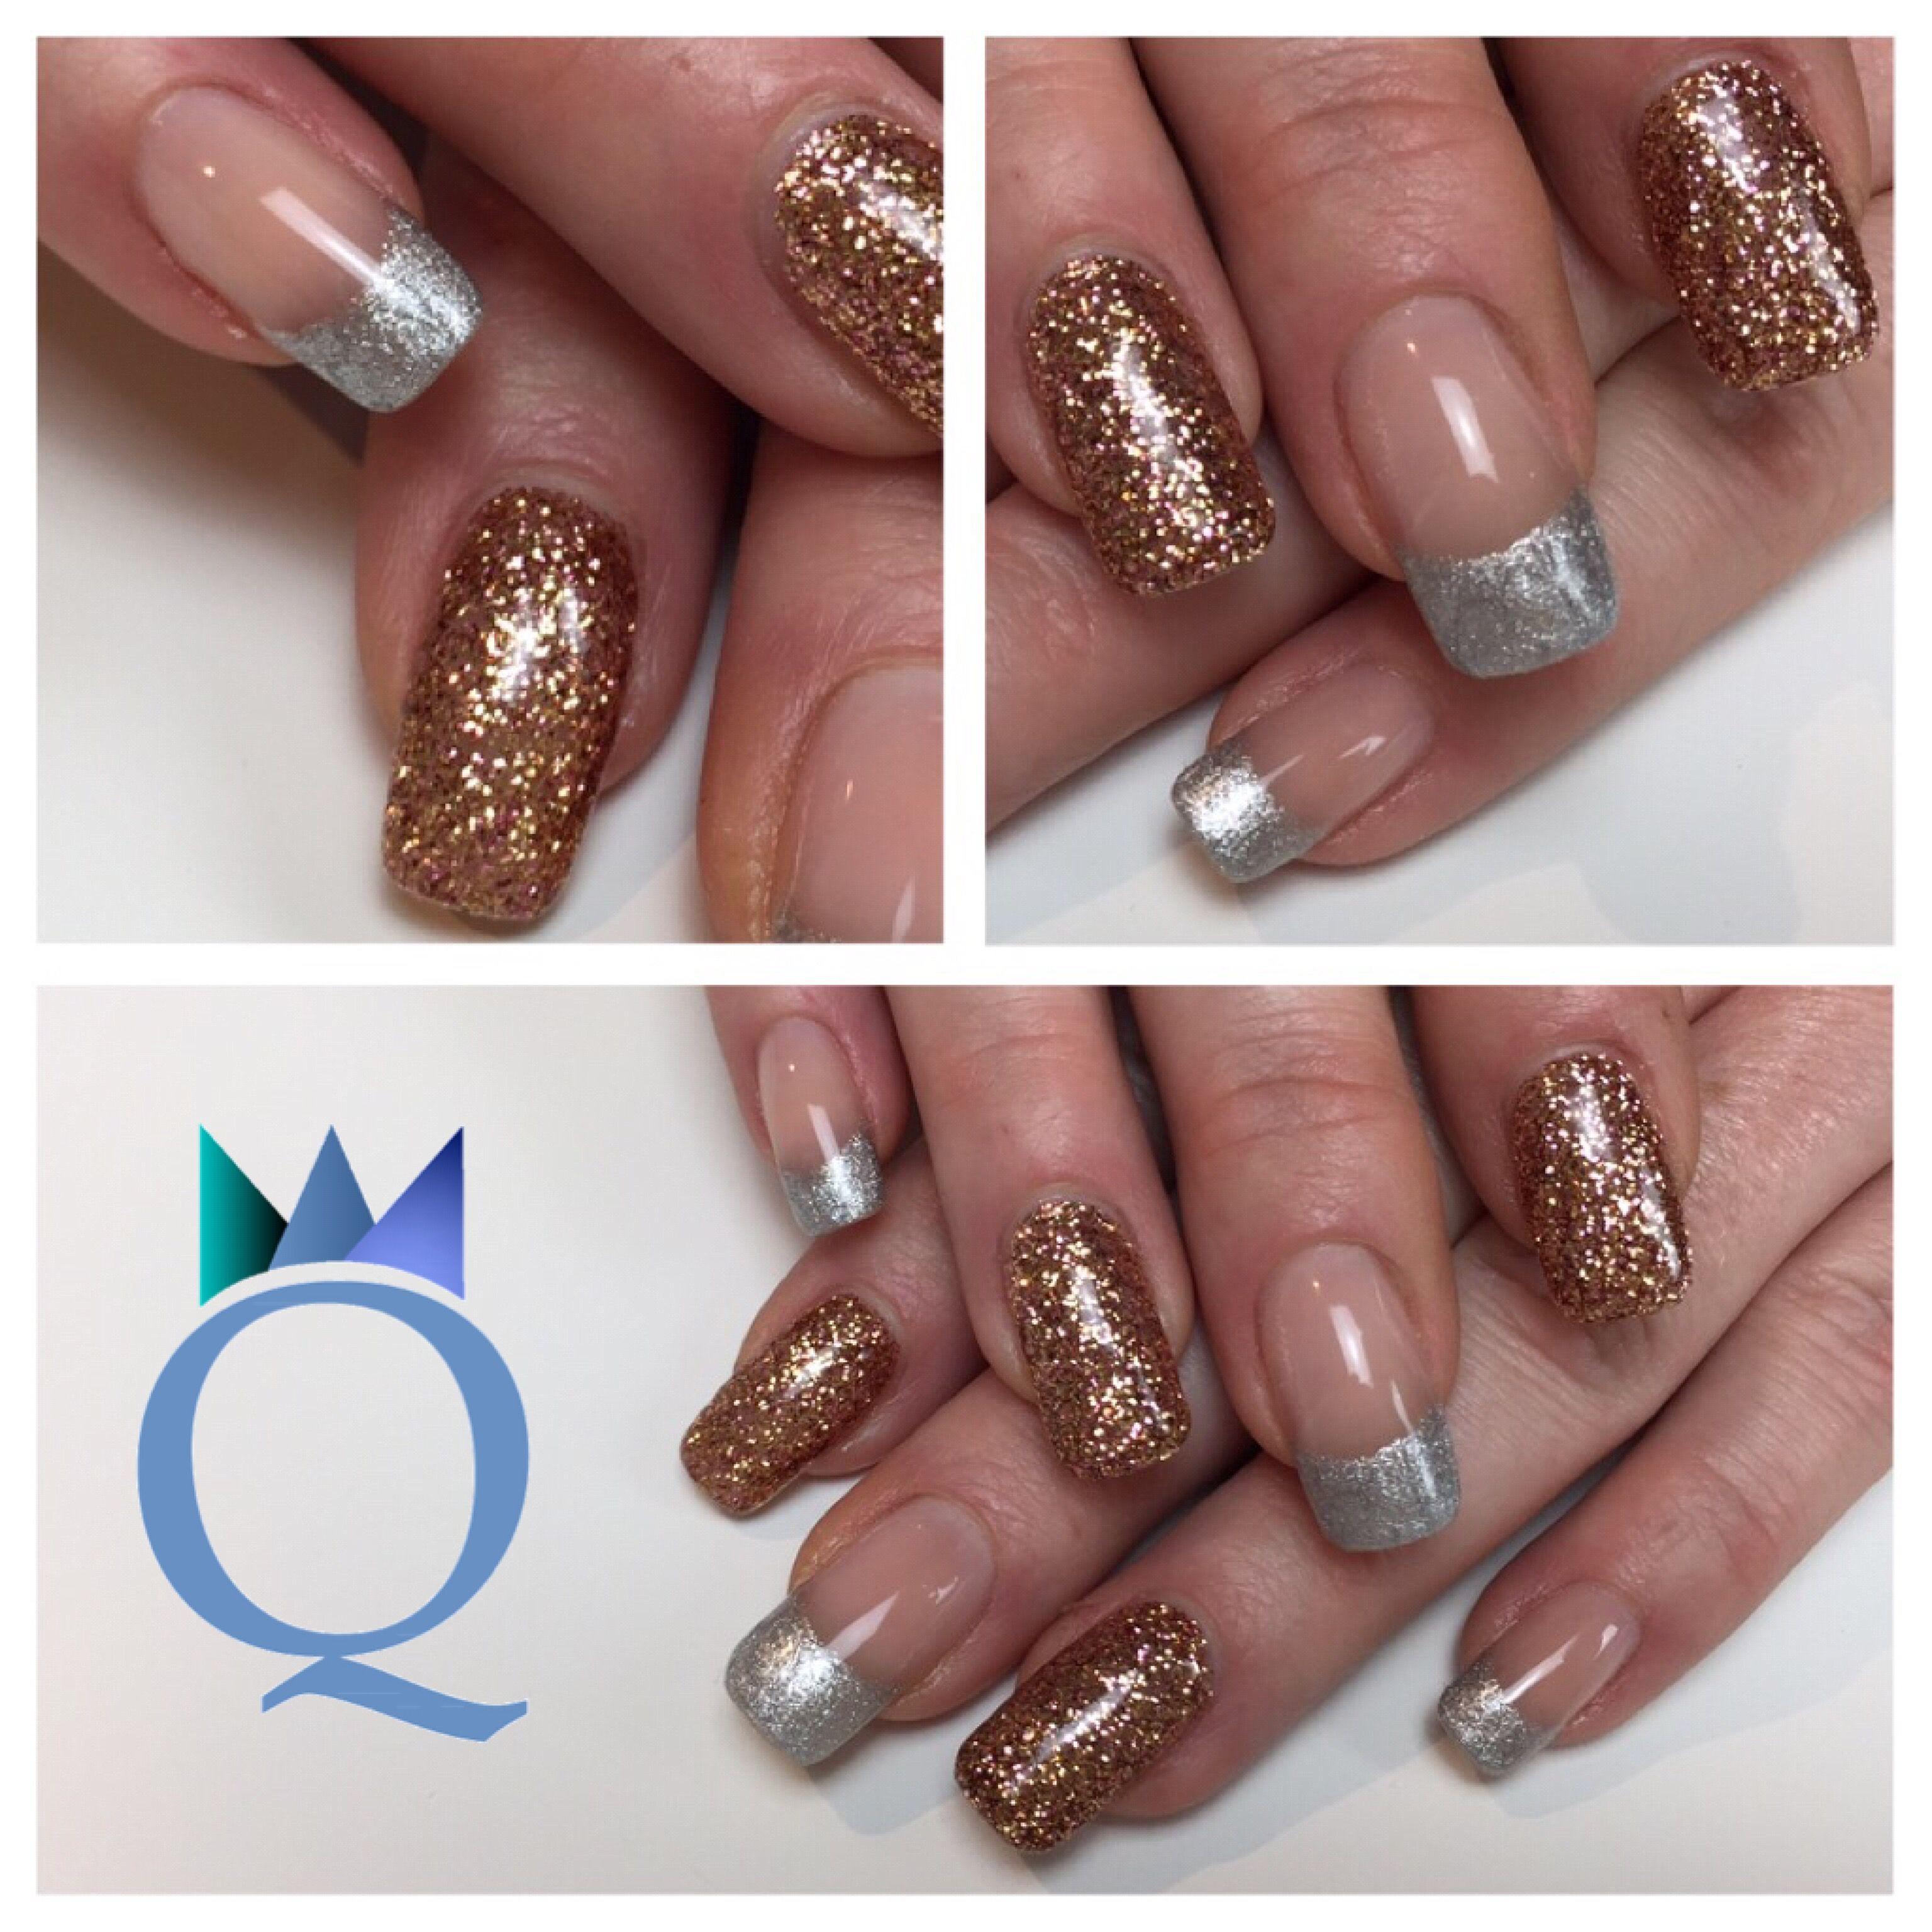 squarenails #acrylicnails #nails #silver #frenchnails #rosegold ...